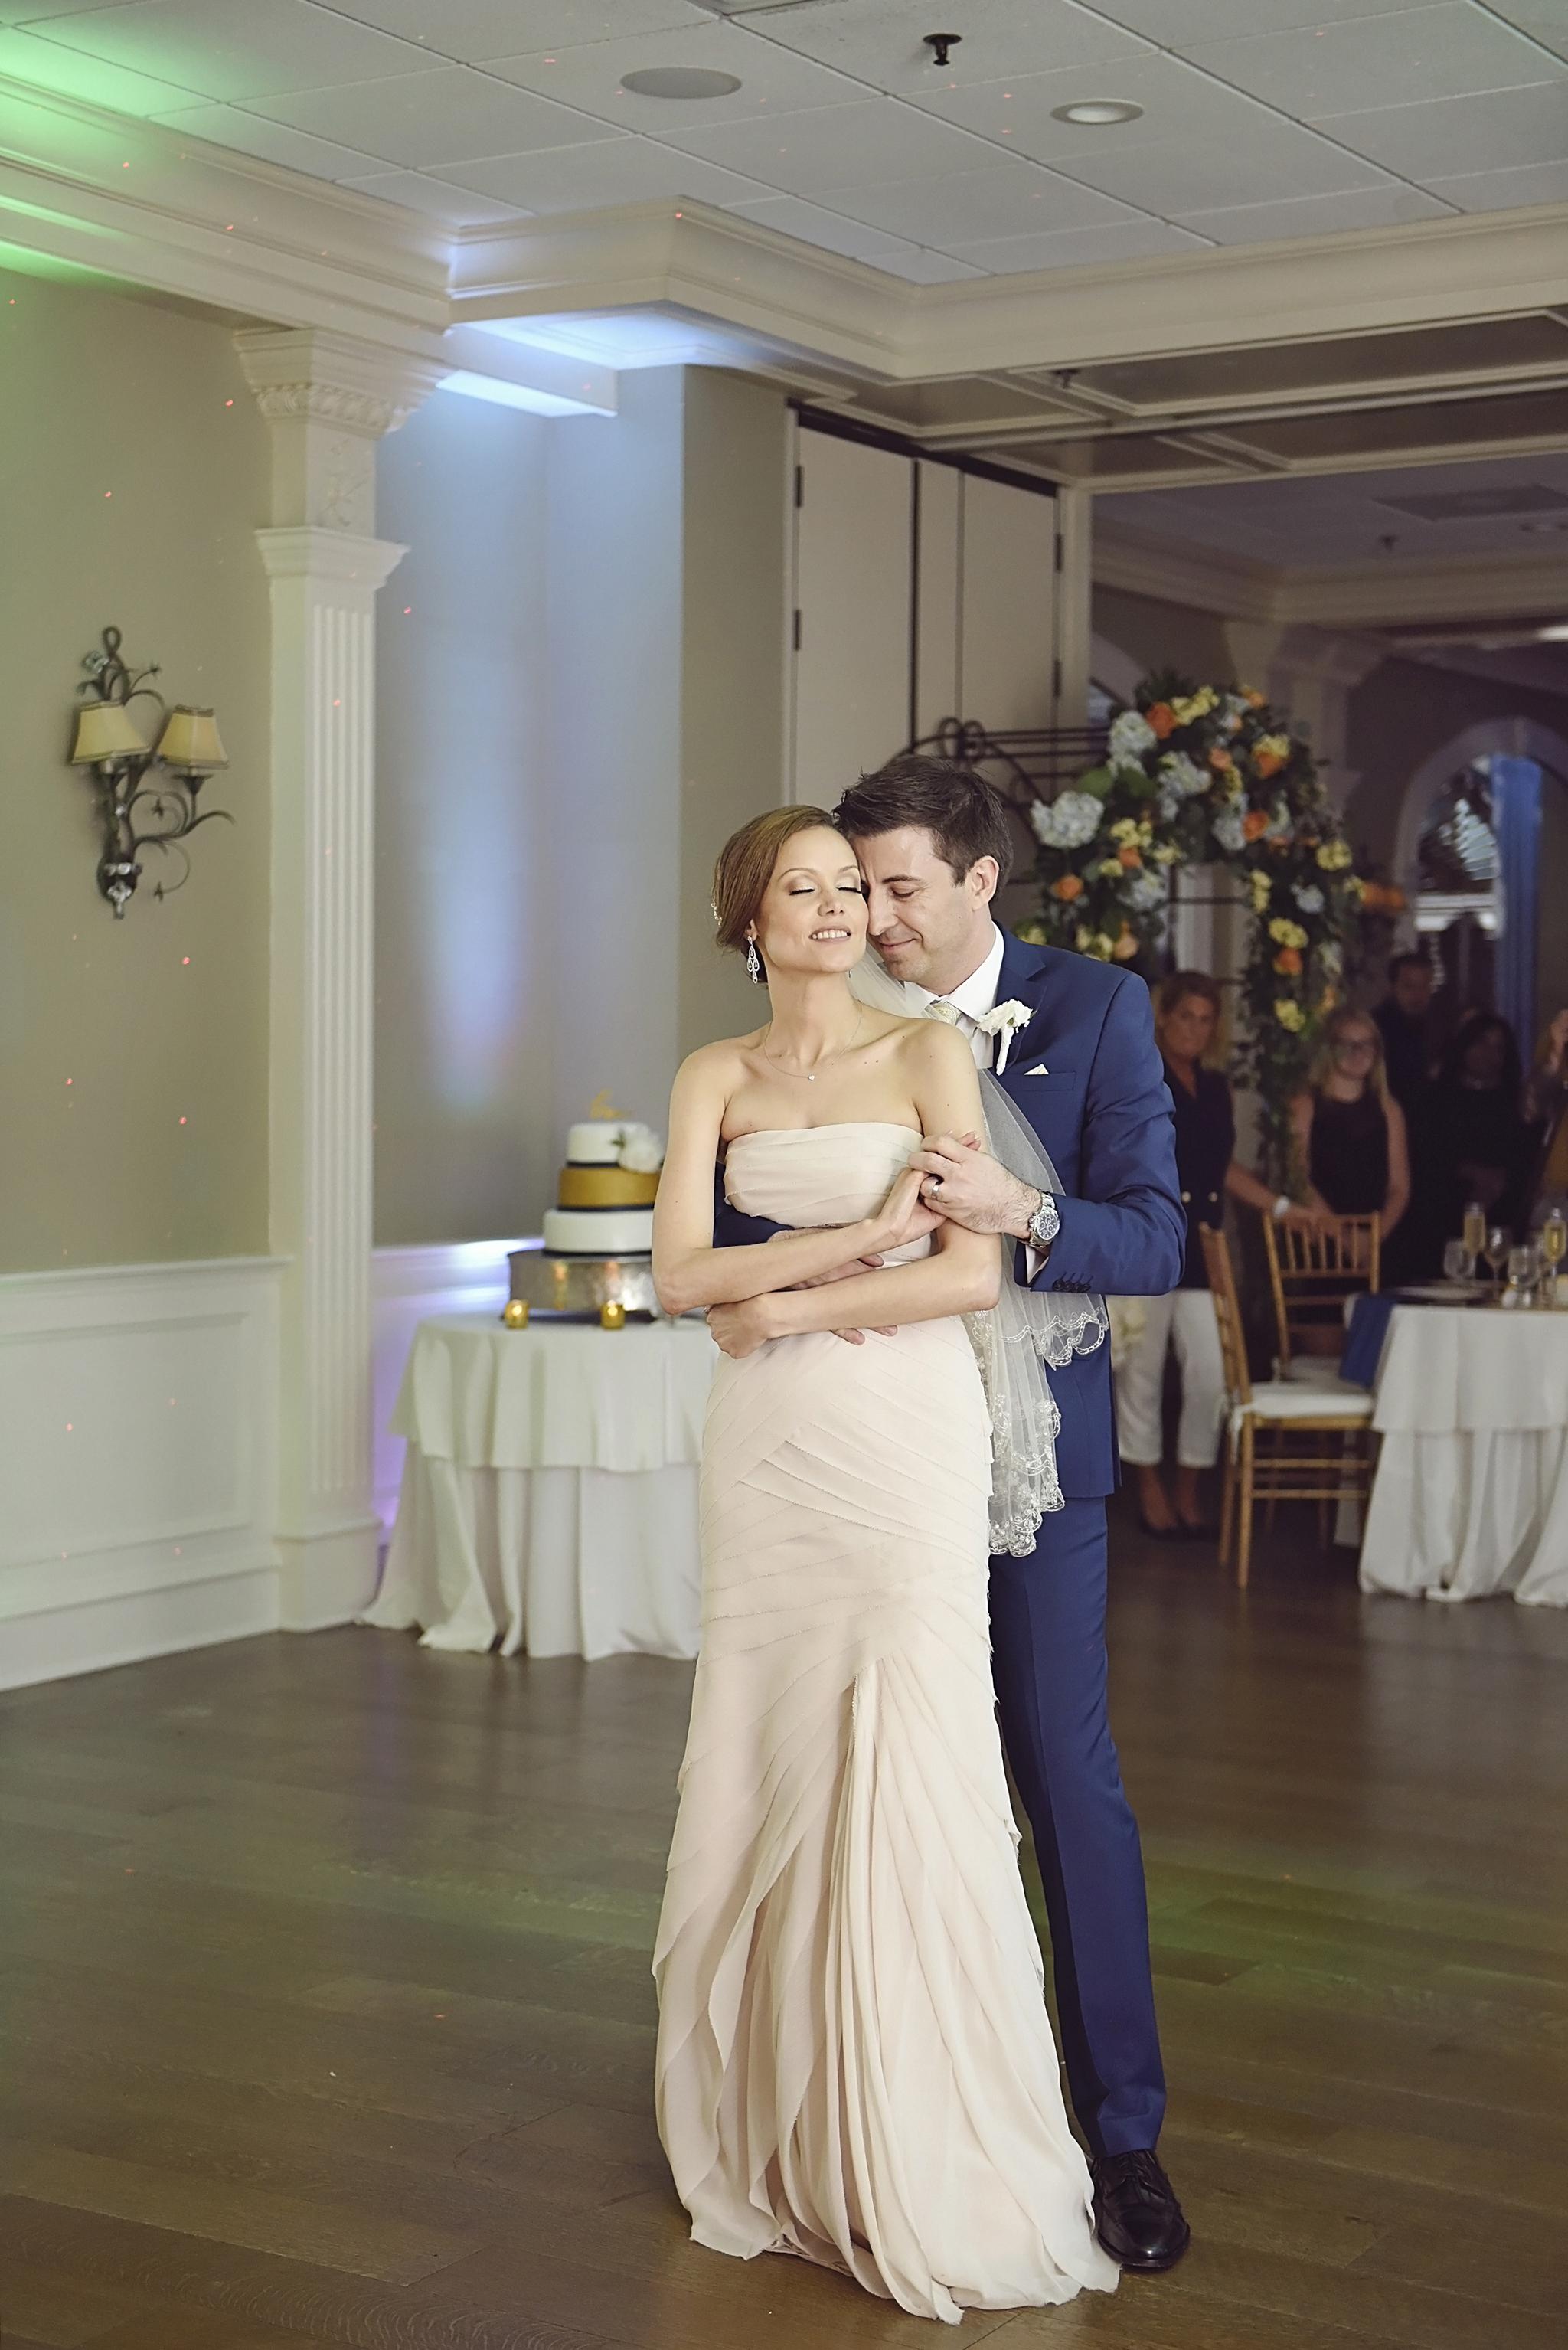 NJ-NY-wedding-photographer-133NJ-NY-wedding-photographer-133NJ-NY-WEDDING-PHOTOGRAPHER-133.JPG